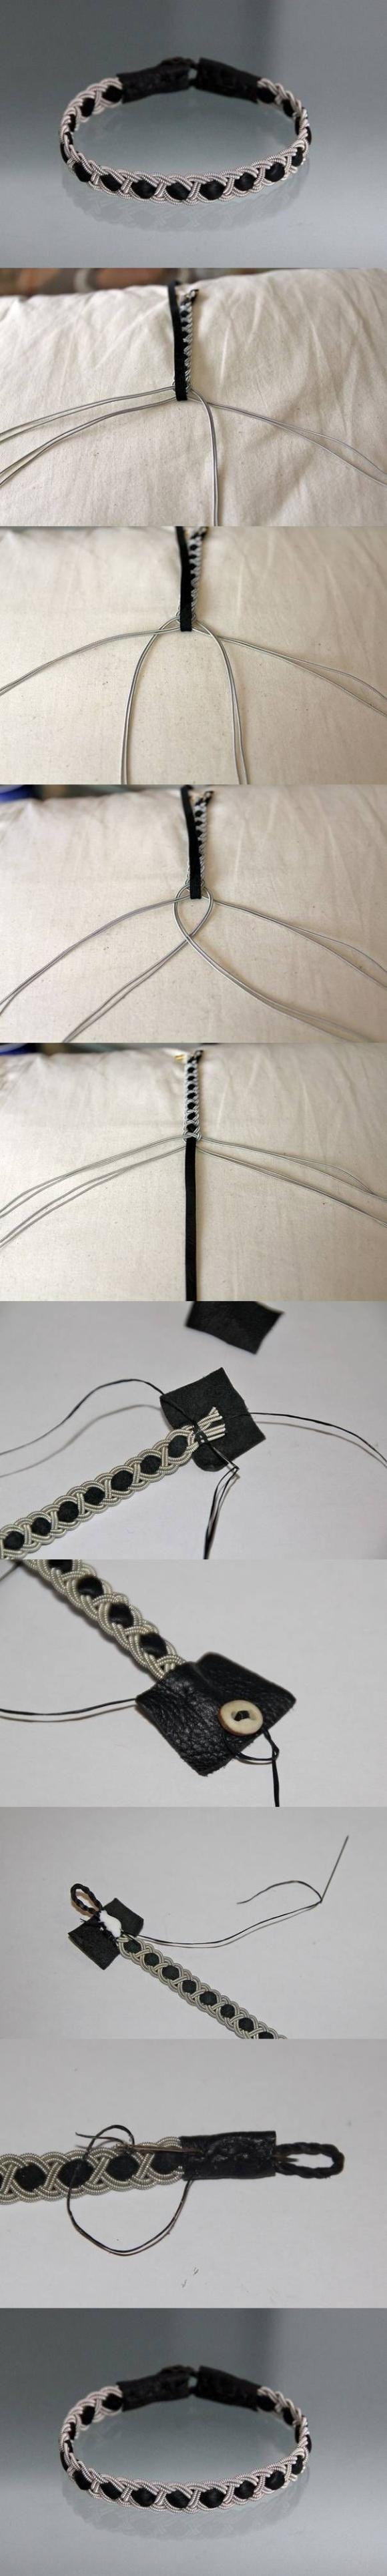 wrap bracelets Ideas, Craft Ideas on wrap bracelets